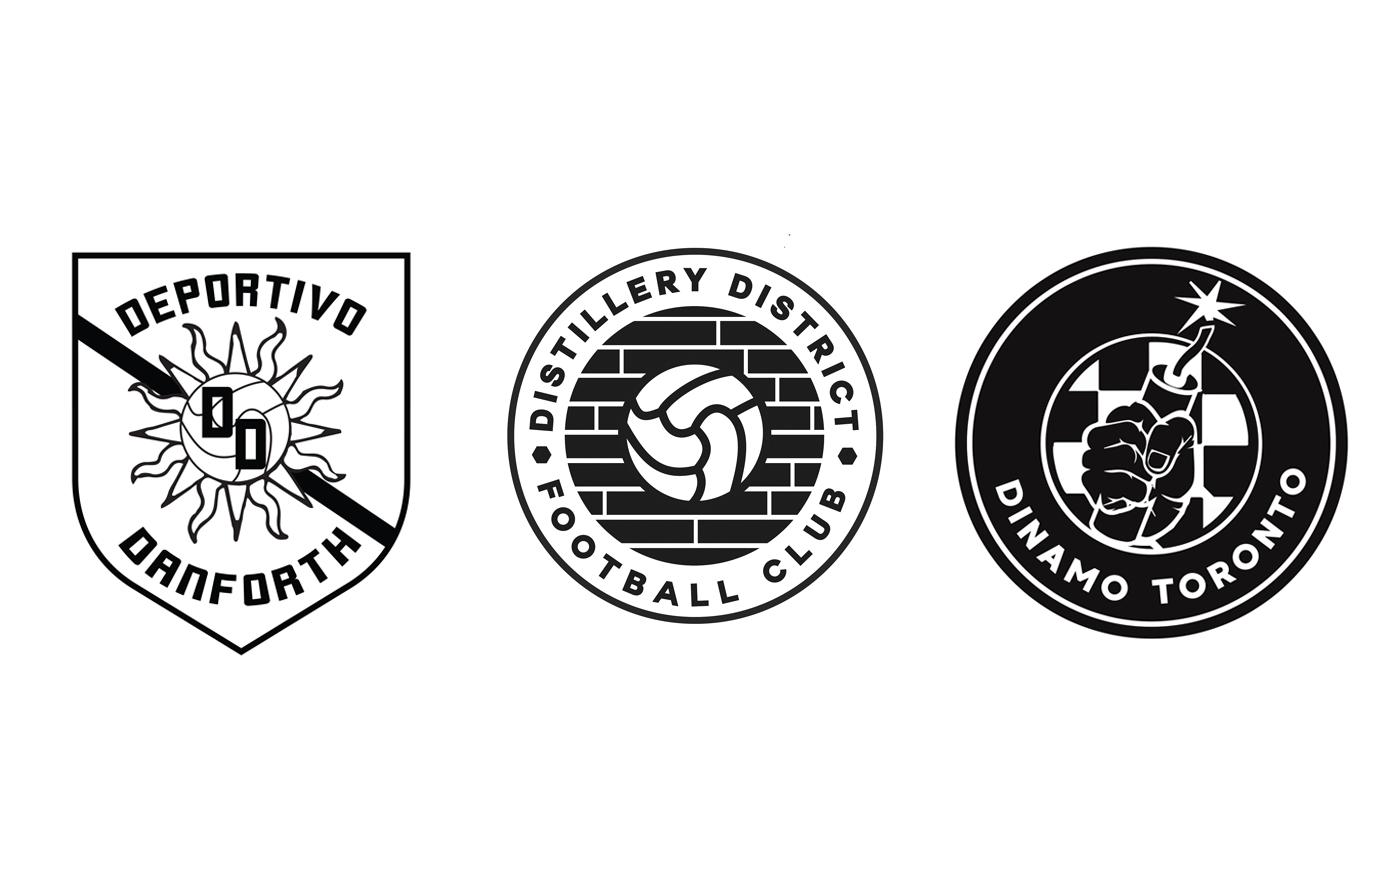 logo logos soccer football Toronto adidas branding  design Canada tshirt